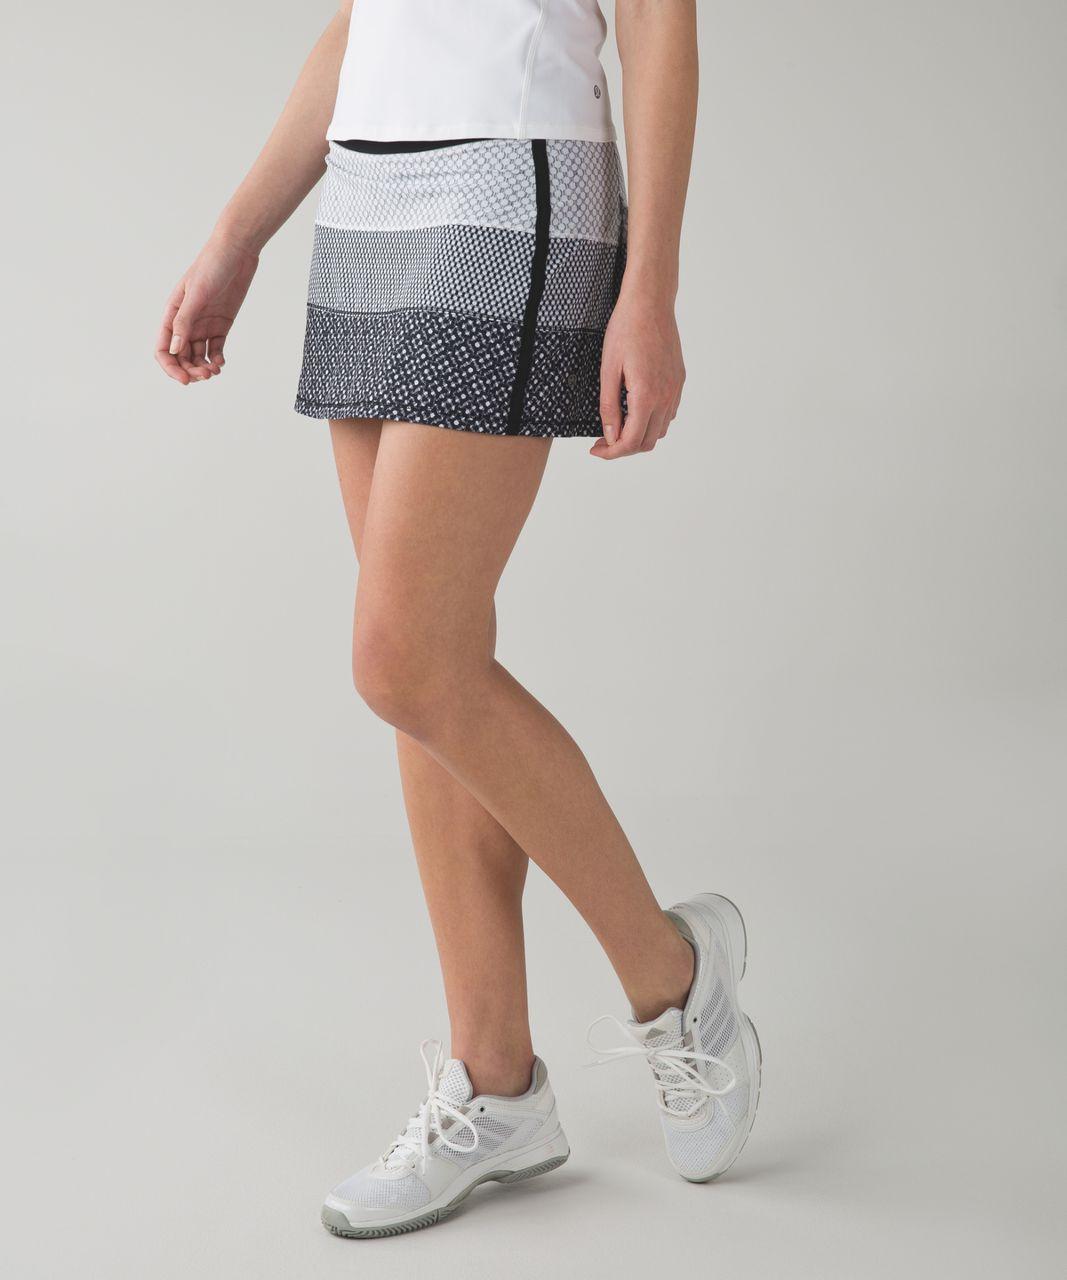 Lululemon Pace Rival Skirt II (Tall) *4-way Stretch - Dottie Eyelet White Black / Mish Mesh White Black / Millie Mesh White Black